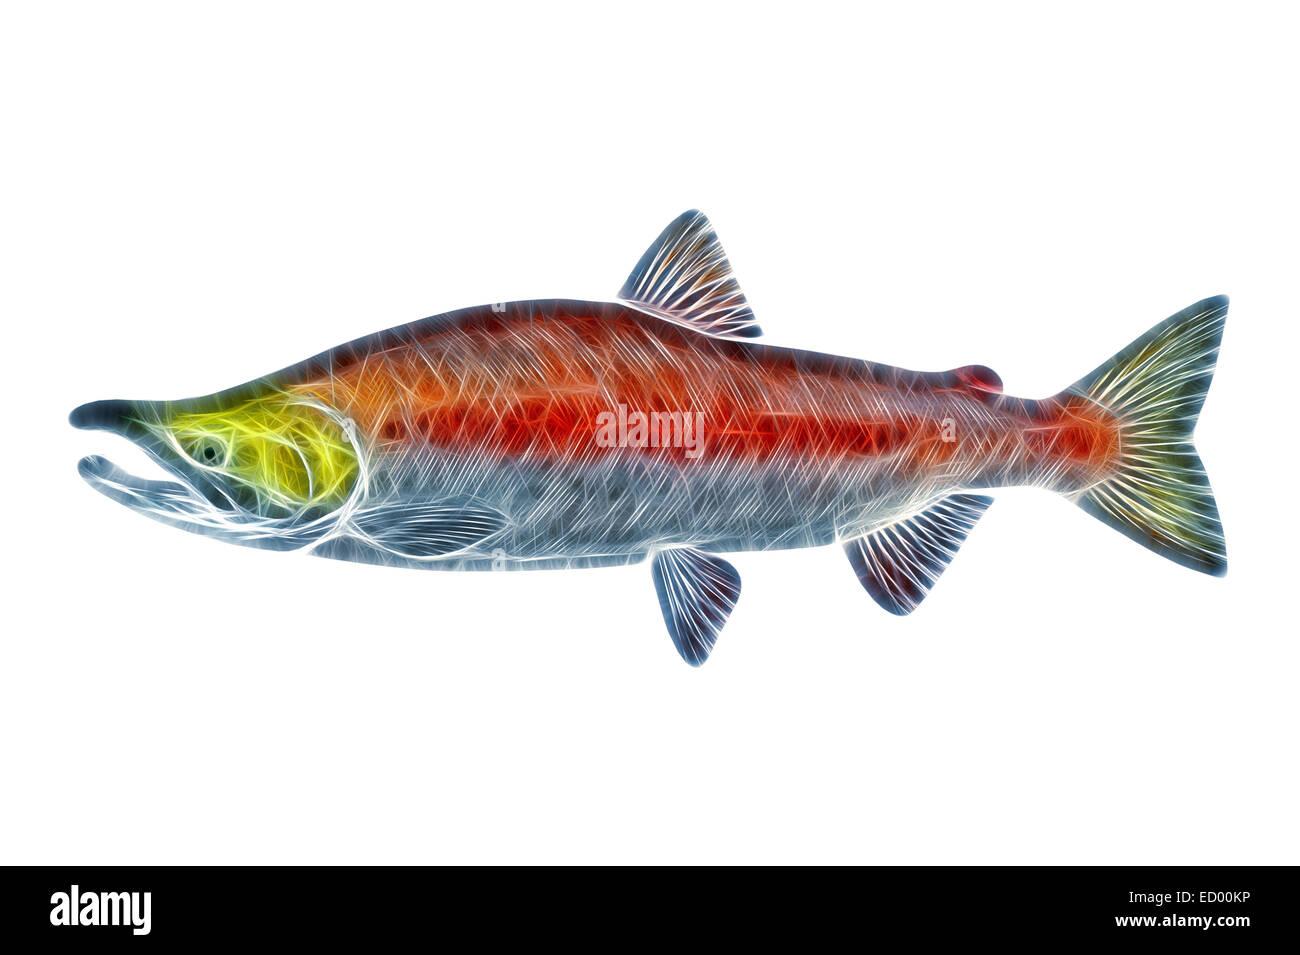 Male Sockeye Salmon (Oncorhynchus nerka) stylized illustration. Pacific salmon adult spawning male. - Stock Image